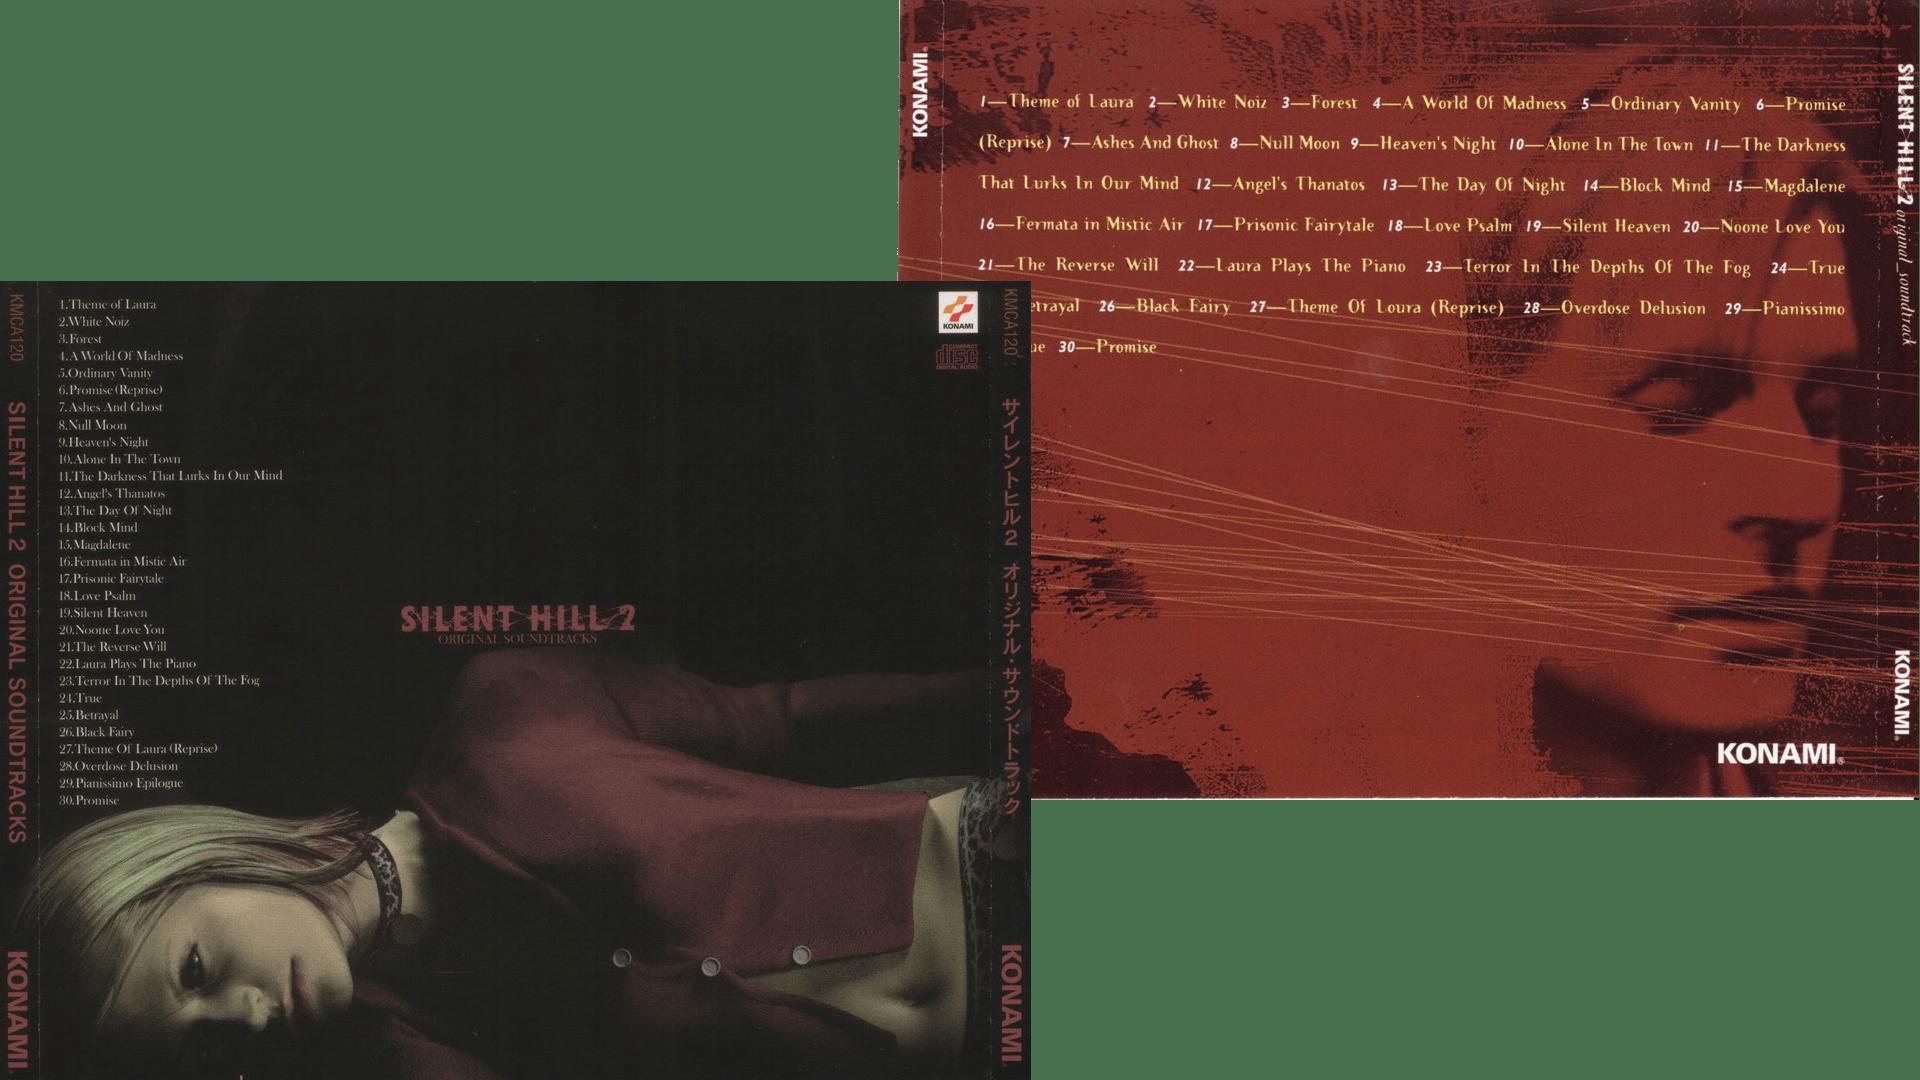 silent hill 2 colonna sonora jap eu